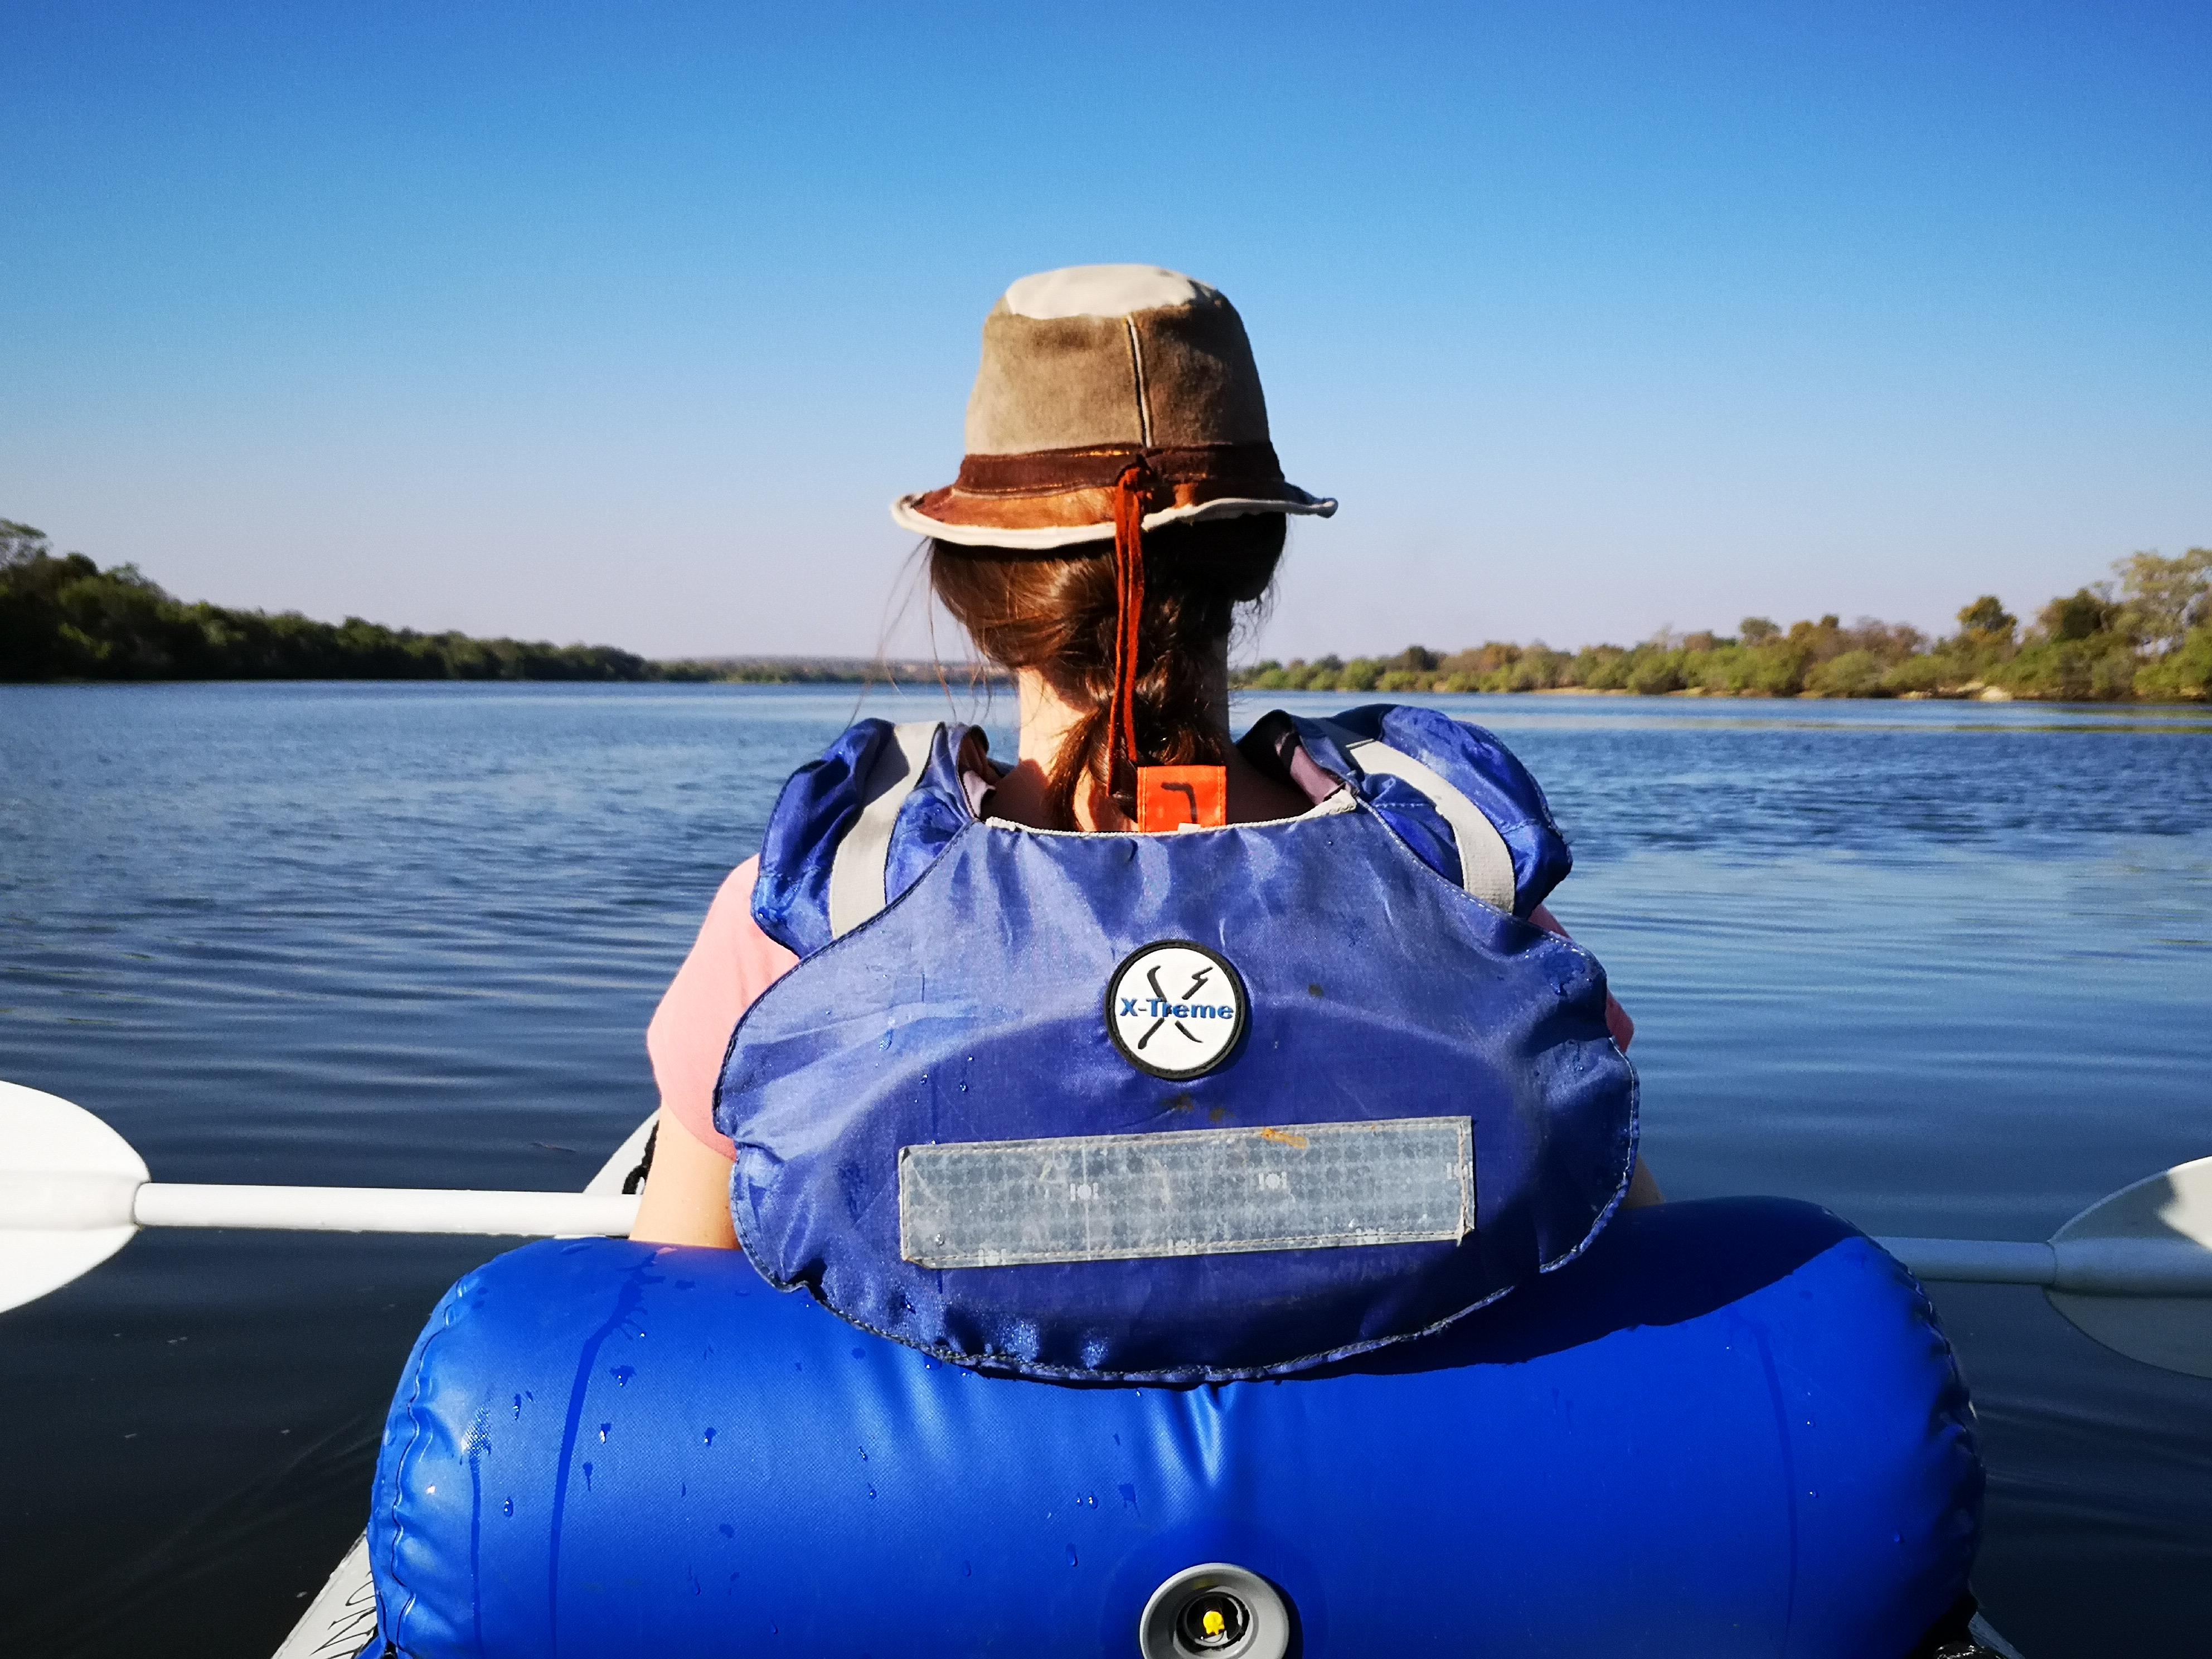 Une personne vue de dos se balade en kayak dans la reserve de zambezi au botswana